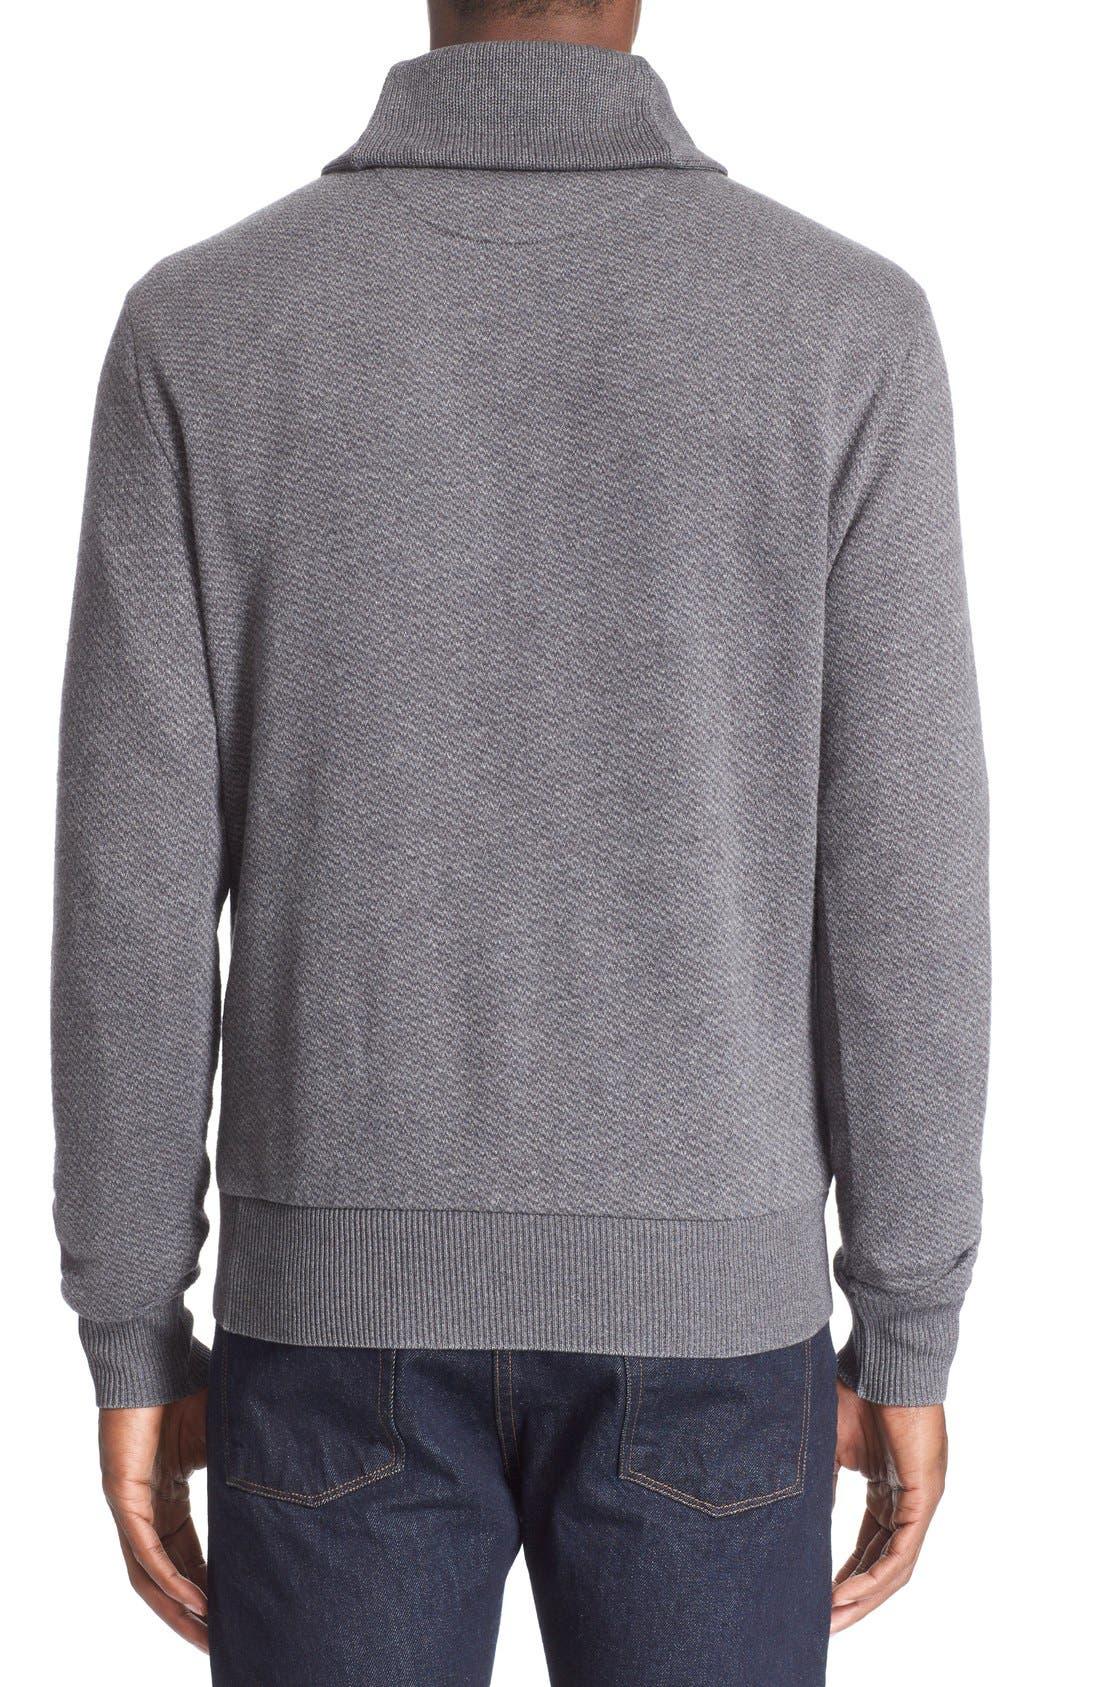 POLO RALPH LAUREN,                             Shawl Collar Sweater,                             Alternate thumbnail 5, color,                             020